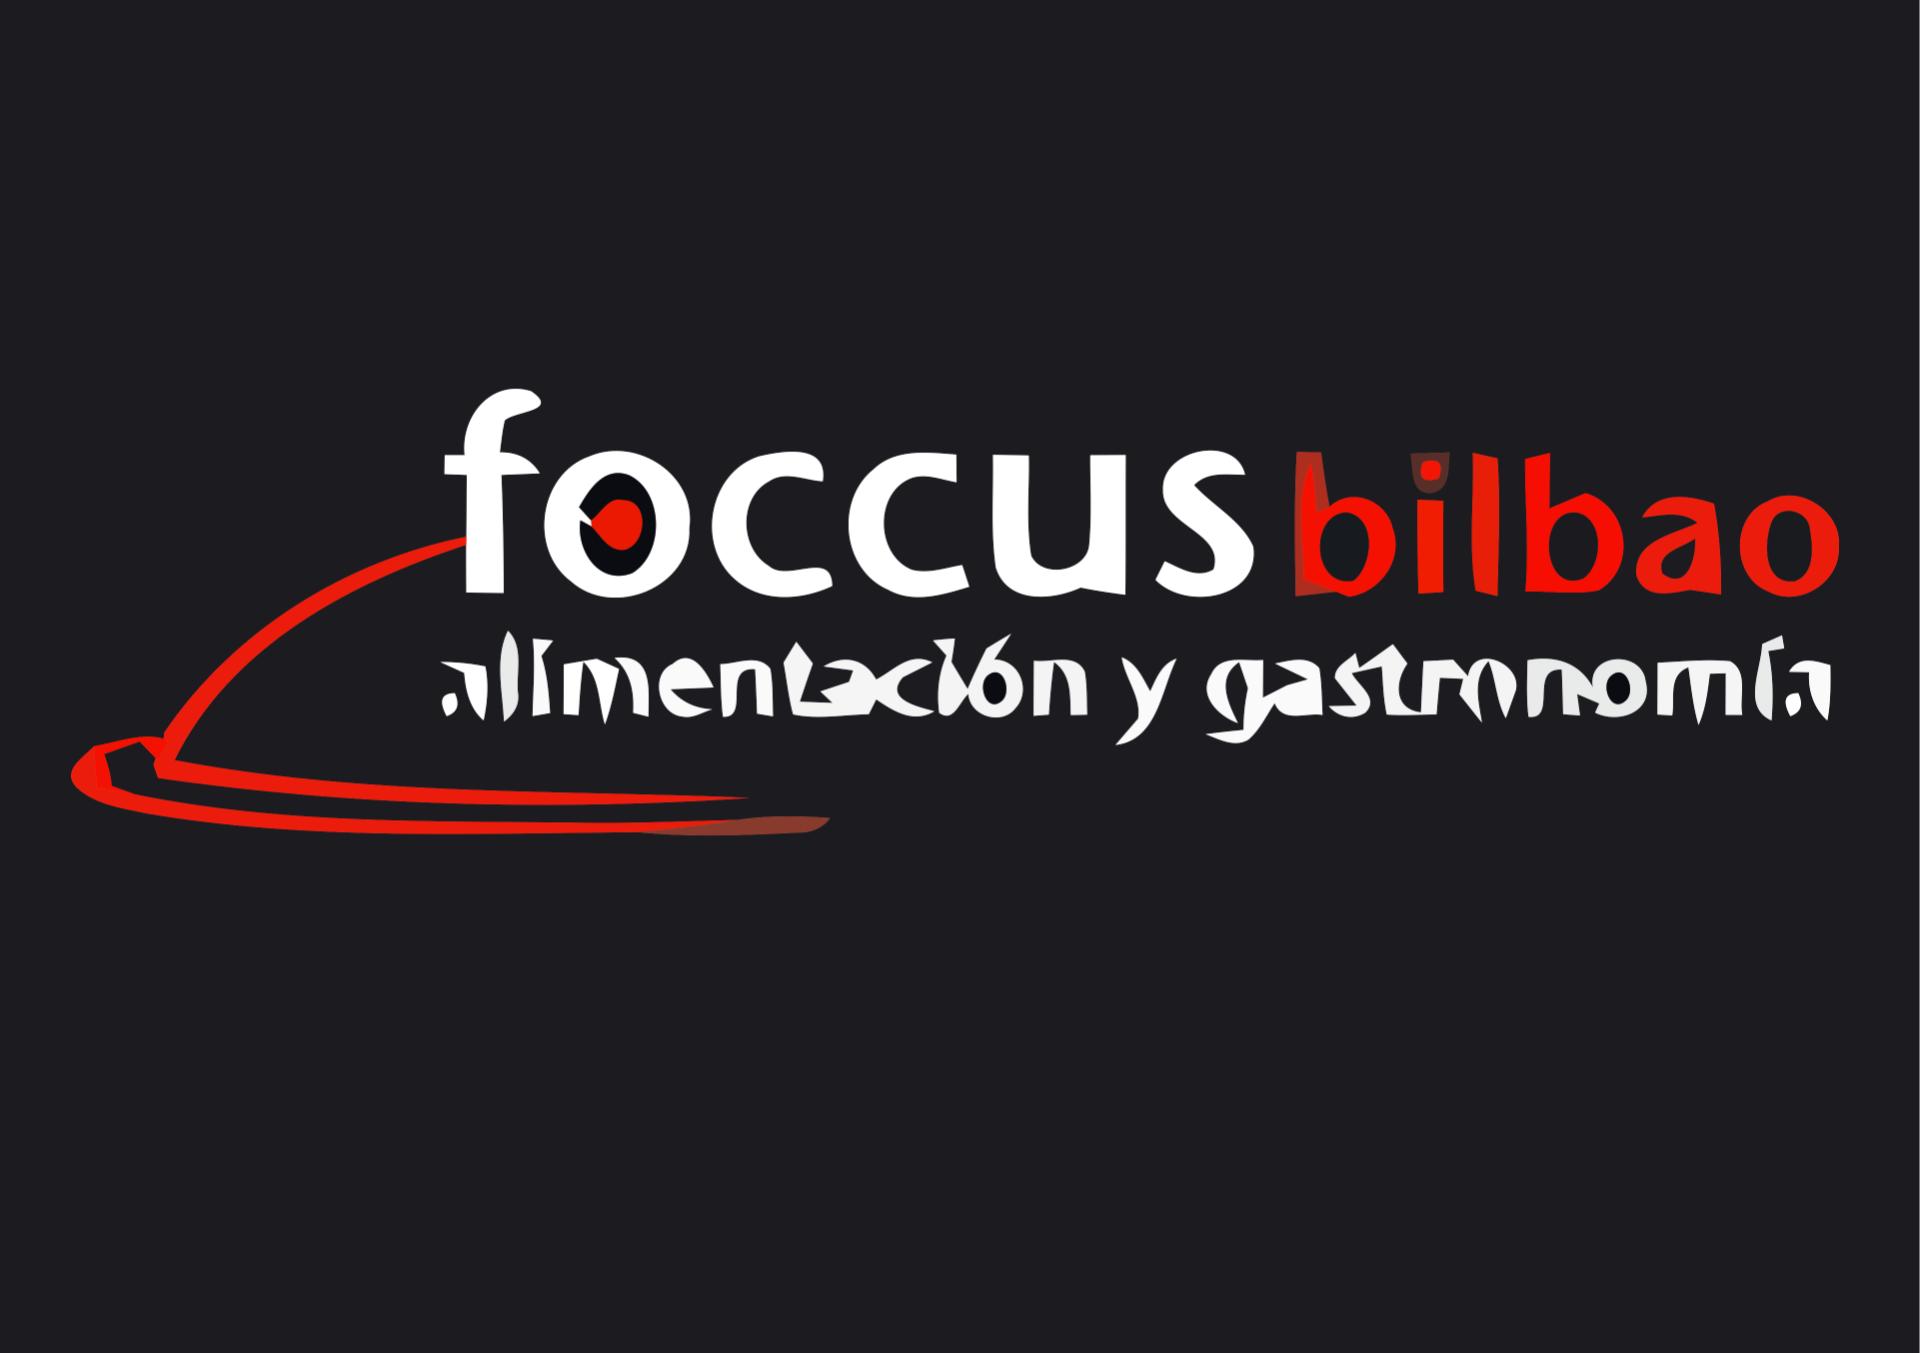 Foccus Bilbao 2009